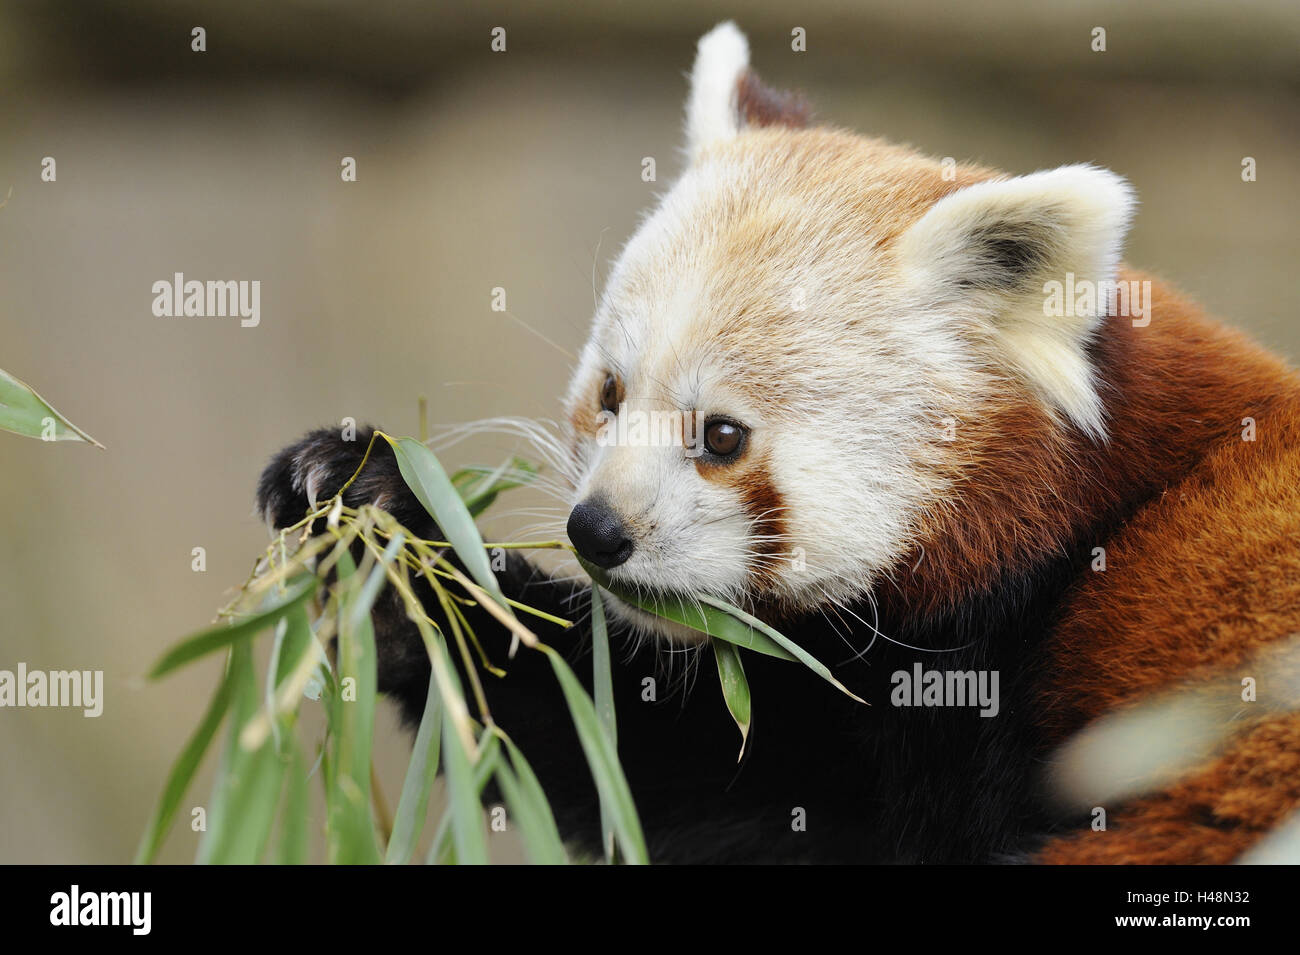 Red panda, portrait, eat, panda, cat's bear, bear's cat, golden dog, predator, land predator, mammal, wild - Stock Image